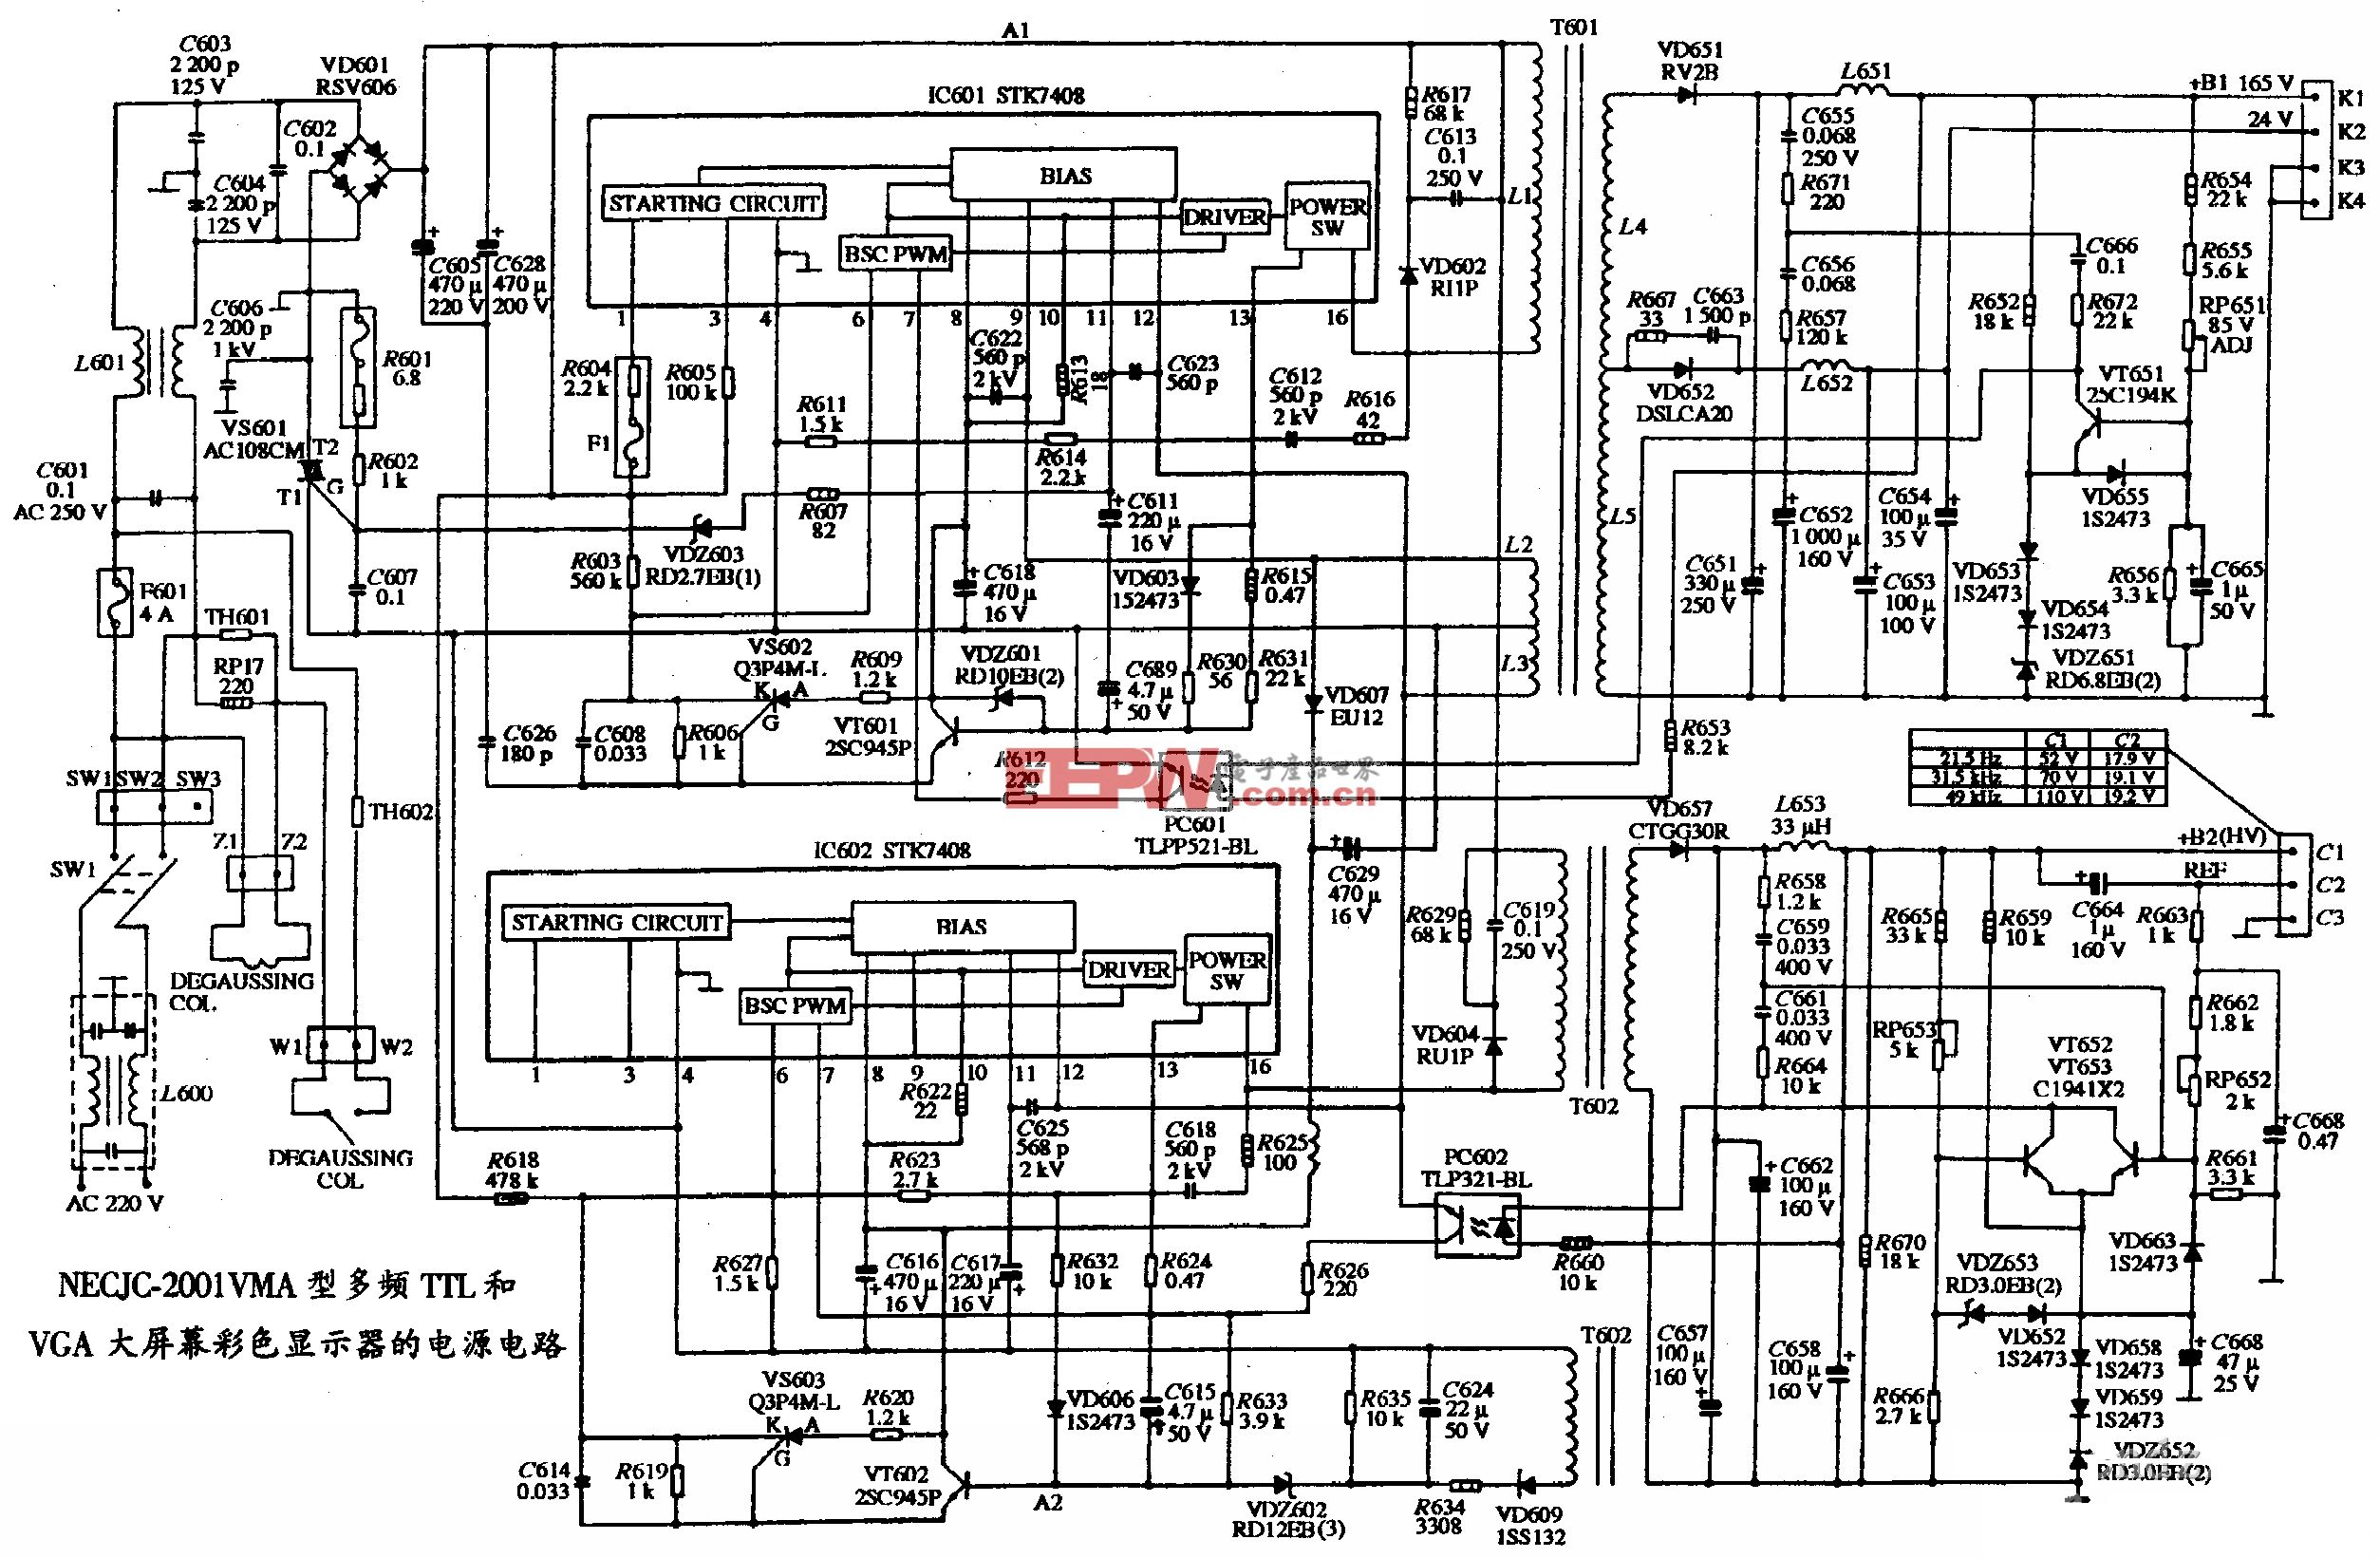 NEC JC-2001VMA型多频TTL和VGA大屏幕彩色显示器的电源电路图